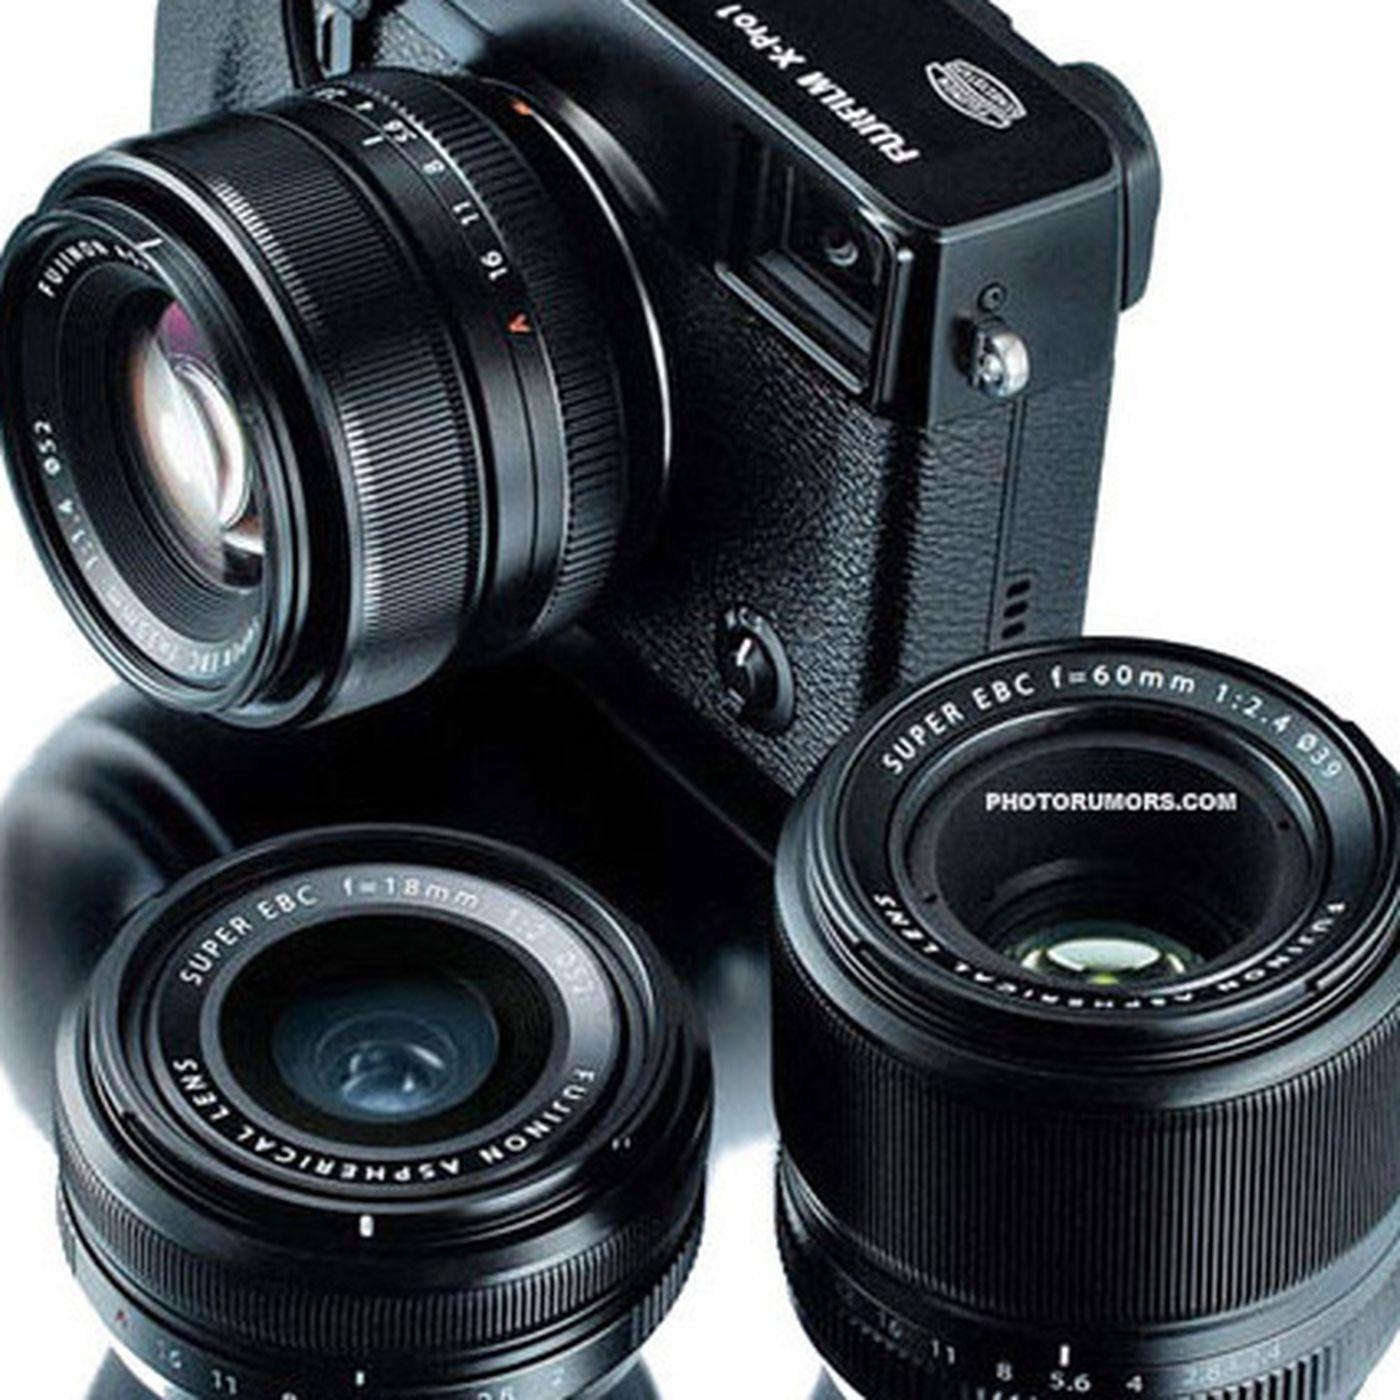 Better Fujifilm X-Pro1 pictures leak as lenses appear for